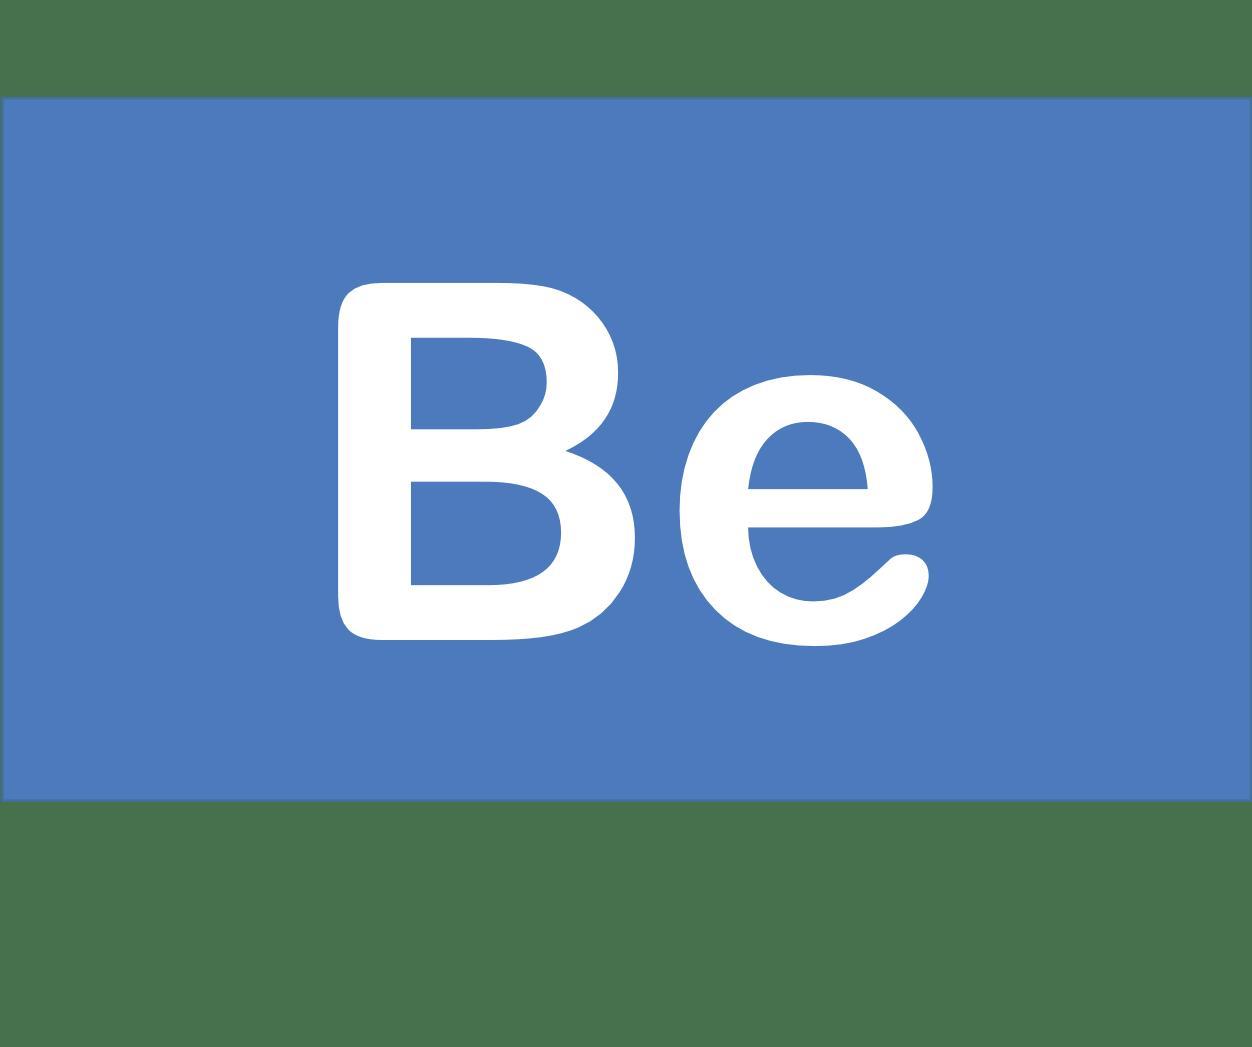 4 Be ベリリウム Beryllium 元素 記号 周期表 化学 原子